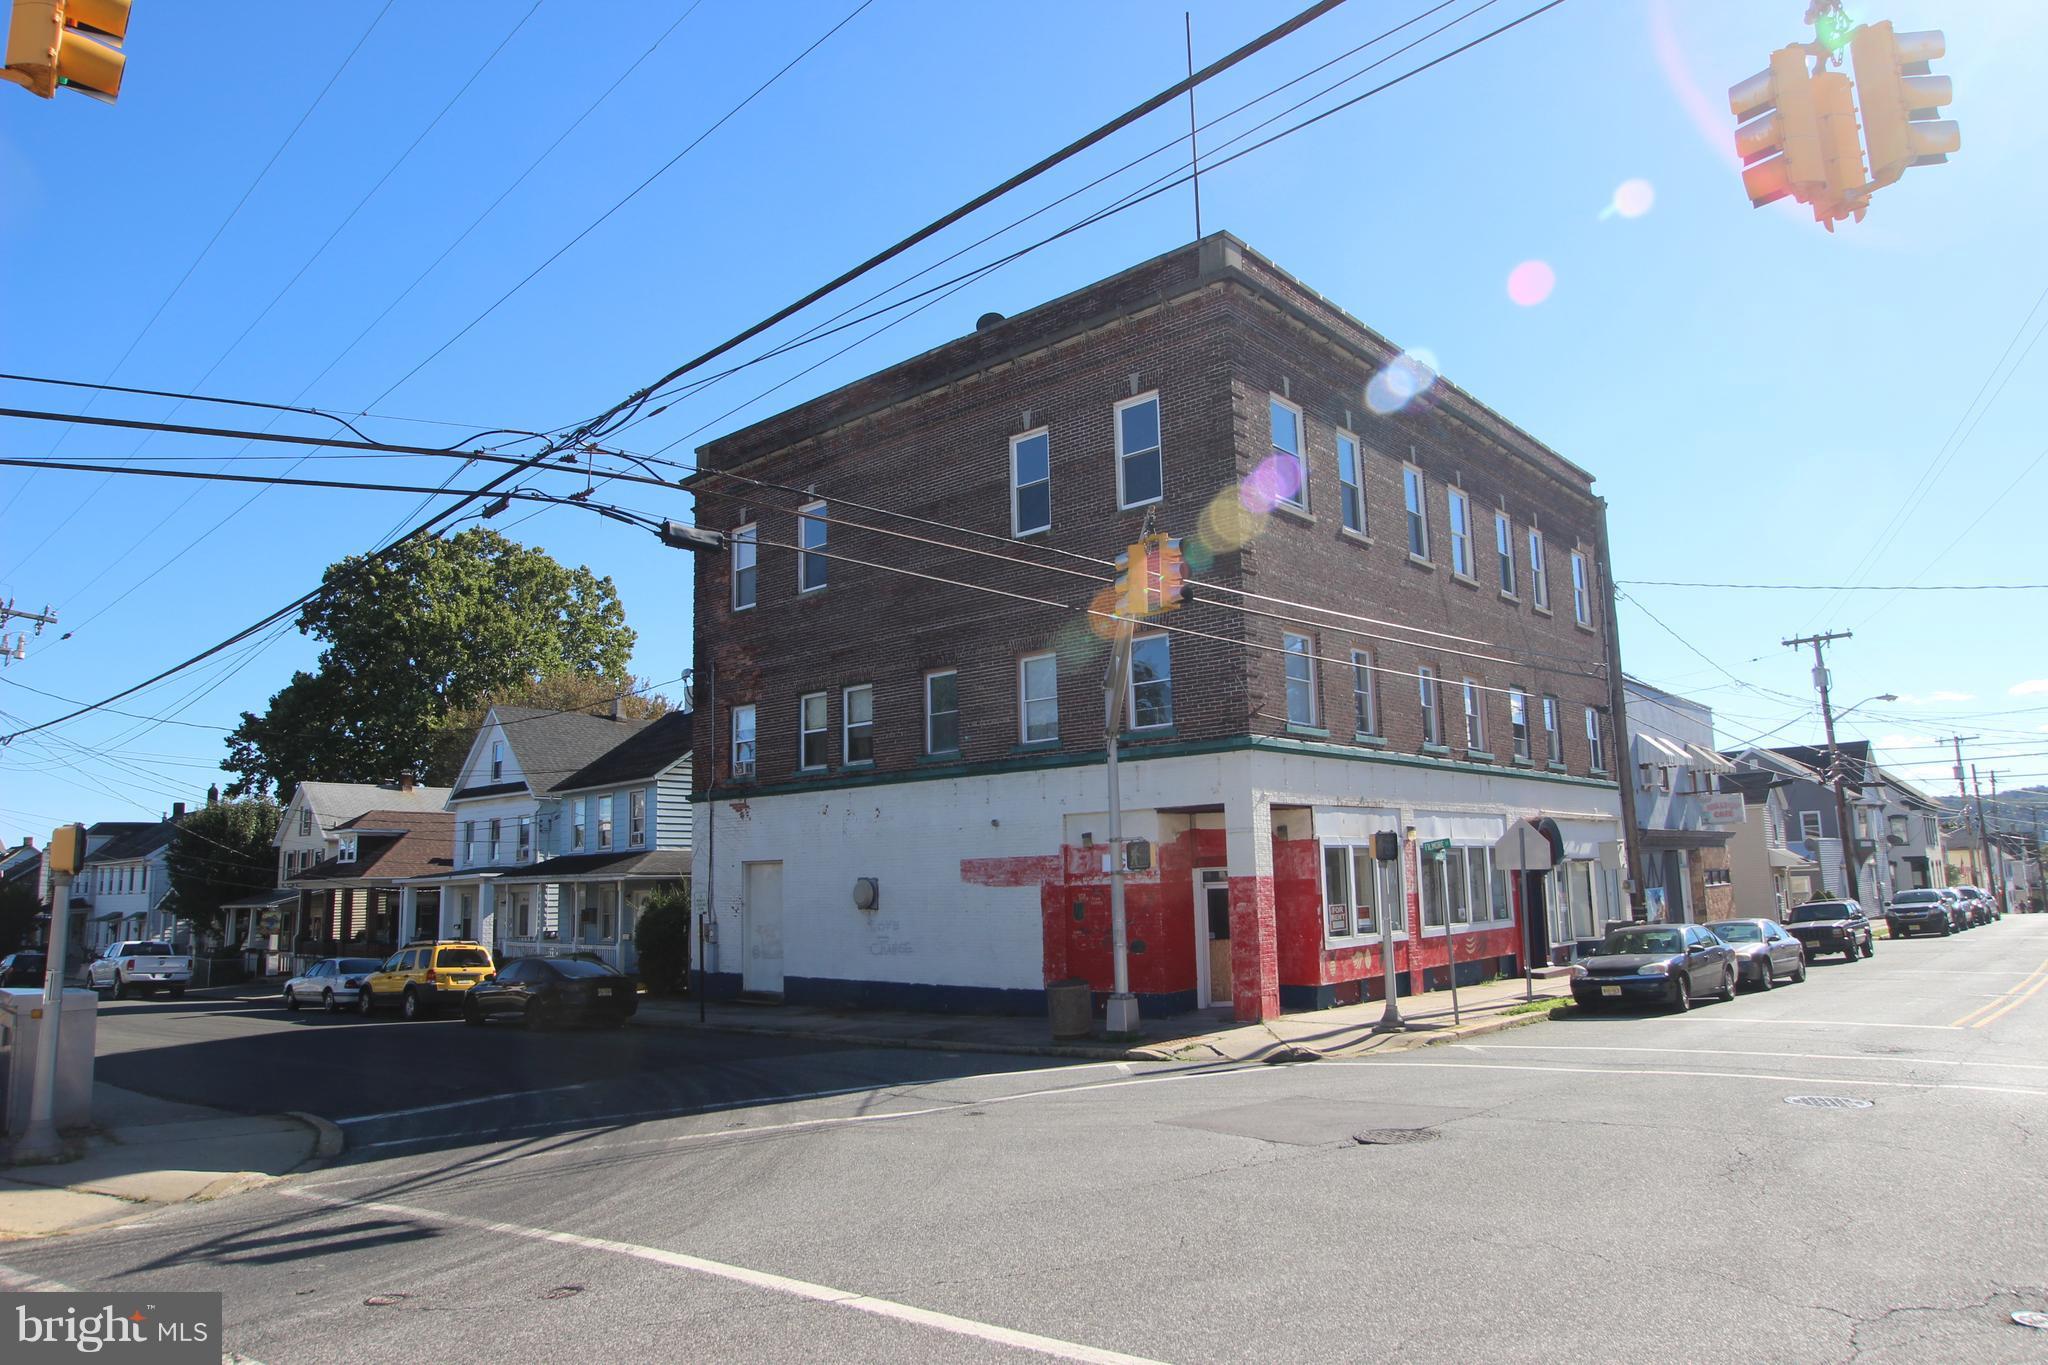 154 HUDSON STREET, PHILLIPSBURG, NJ 08865